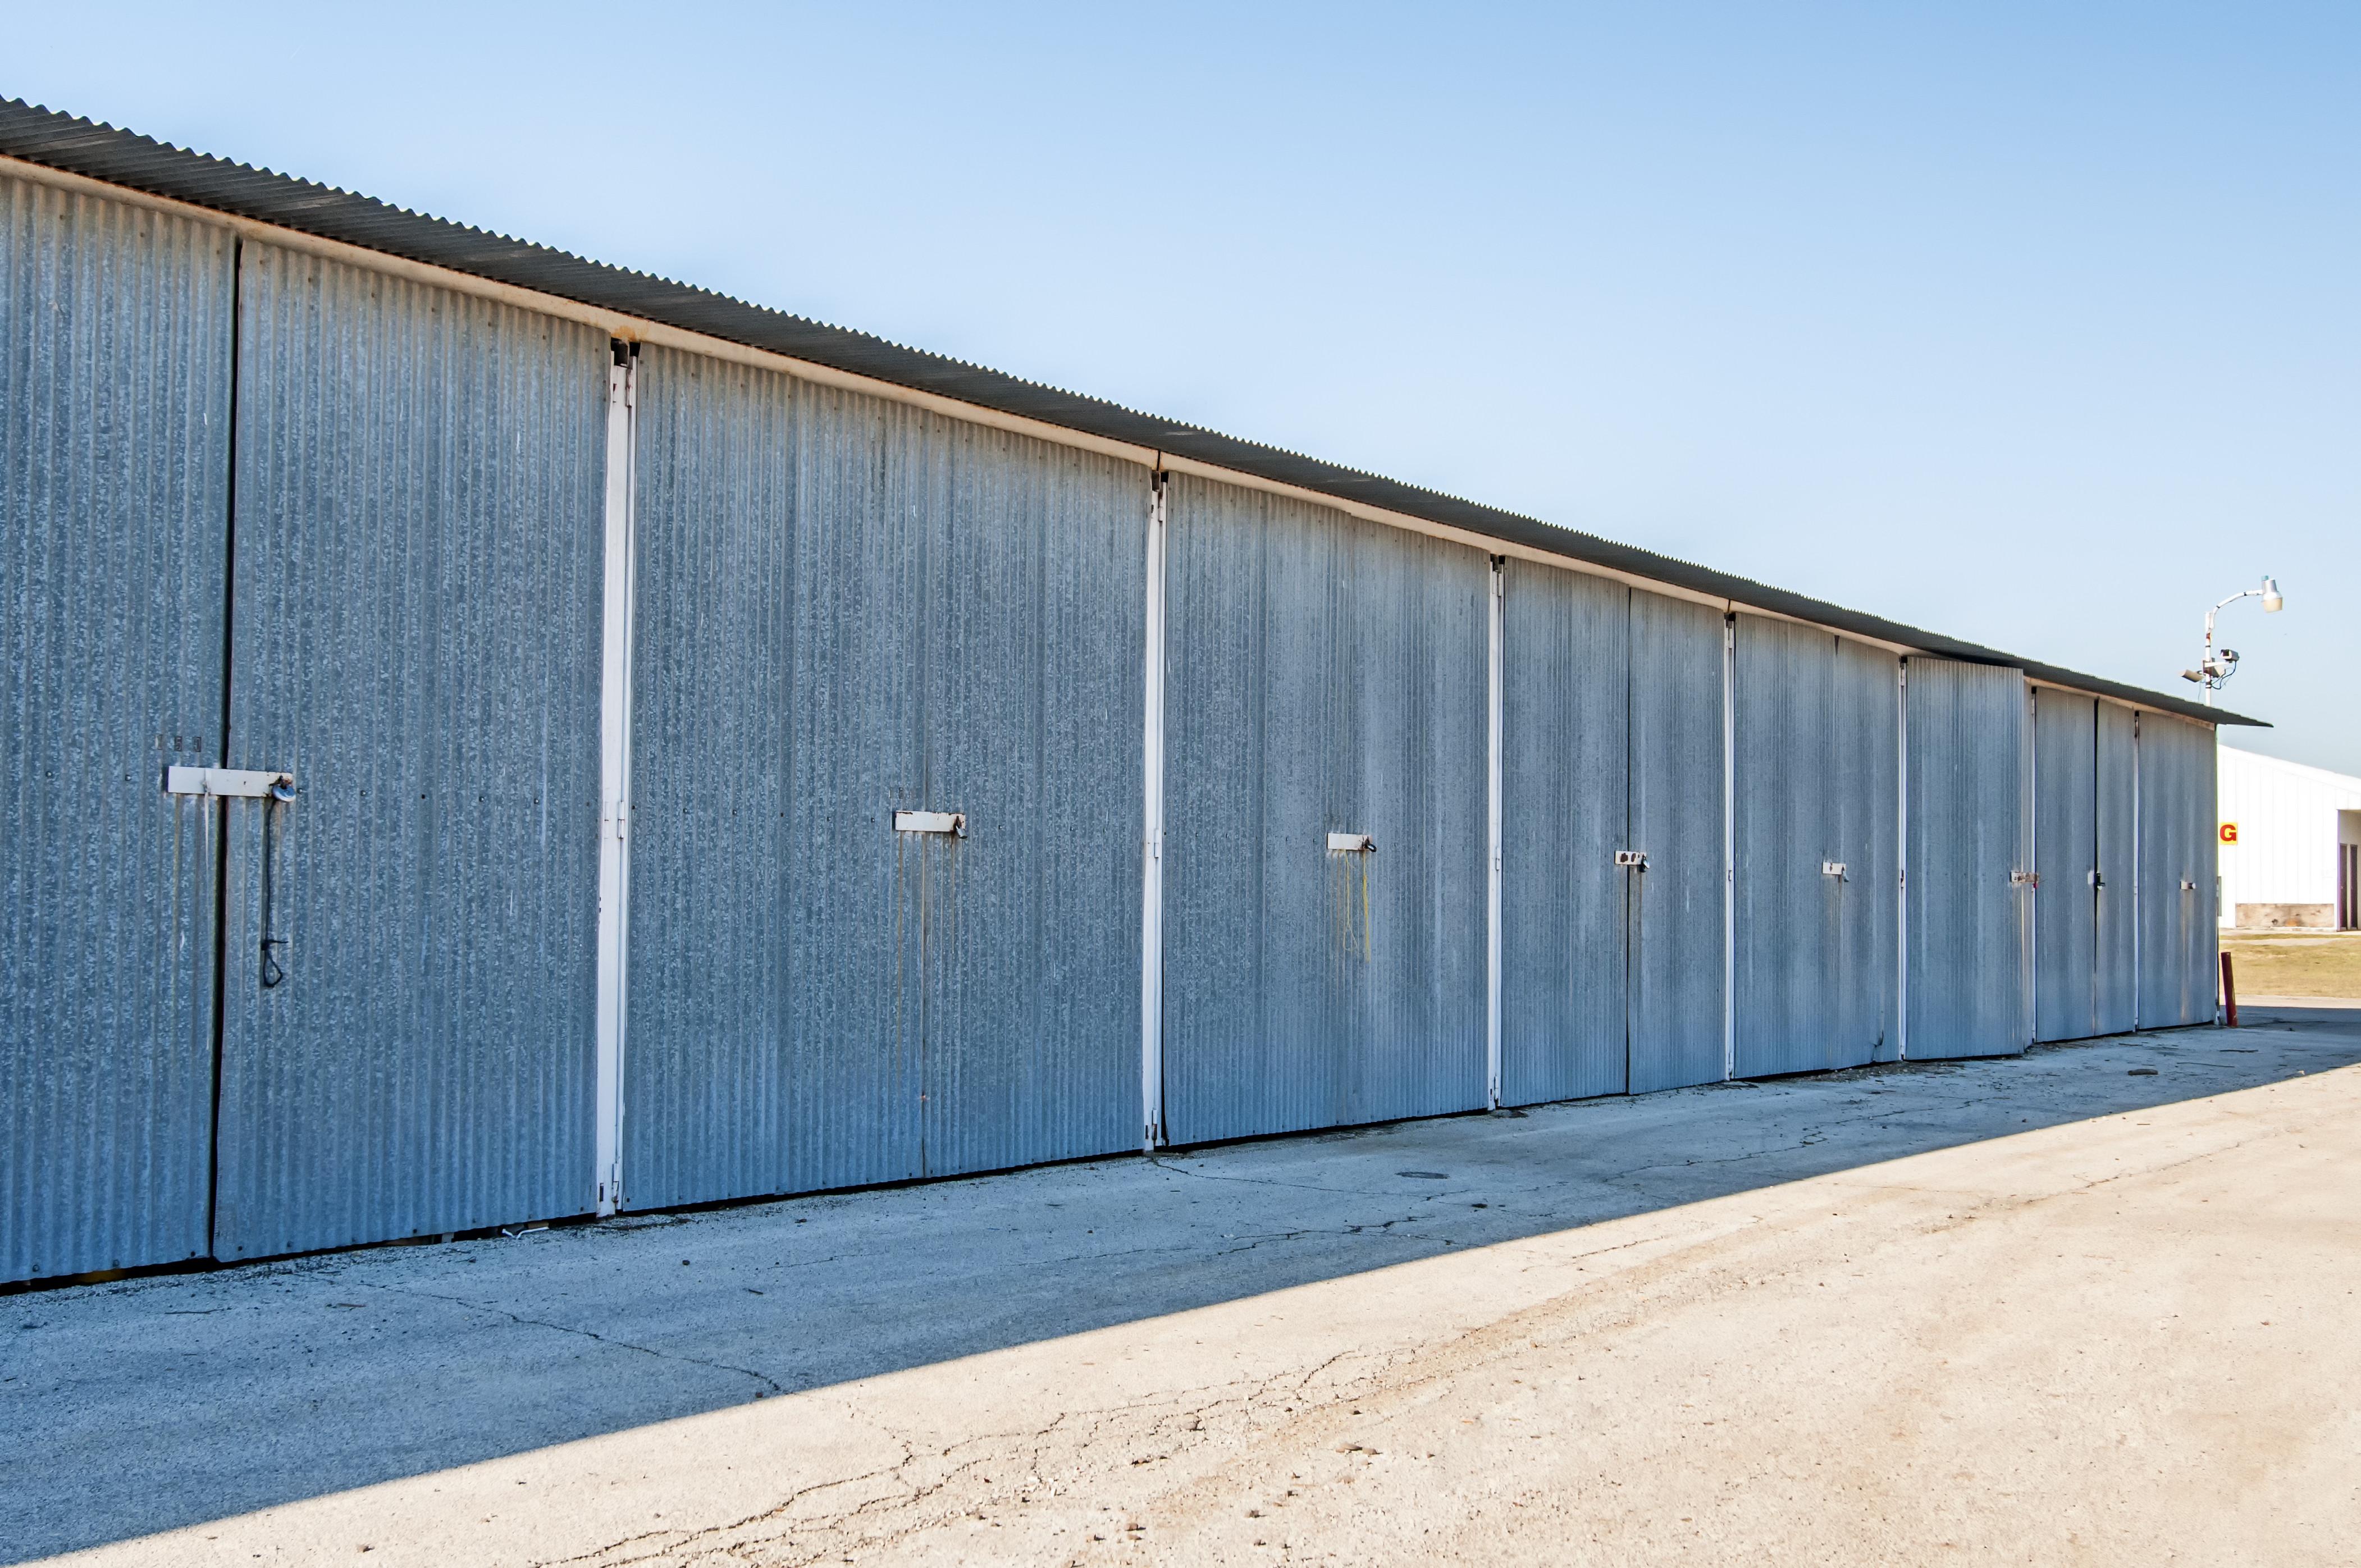 Lockaway Storage San Antonio Tx 78254 Dandk Organizer